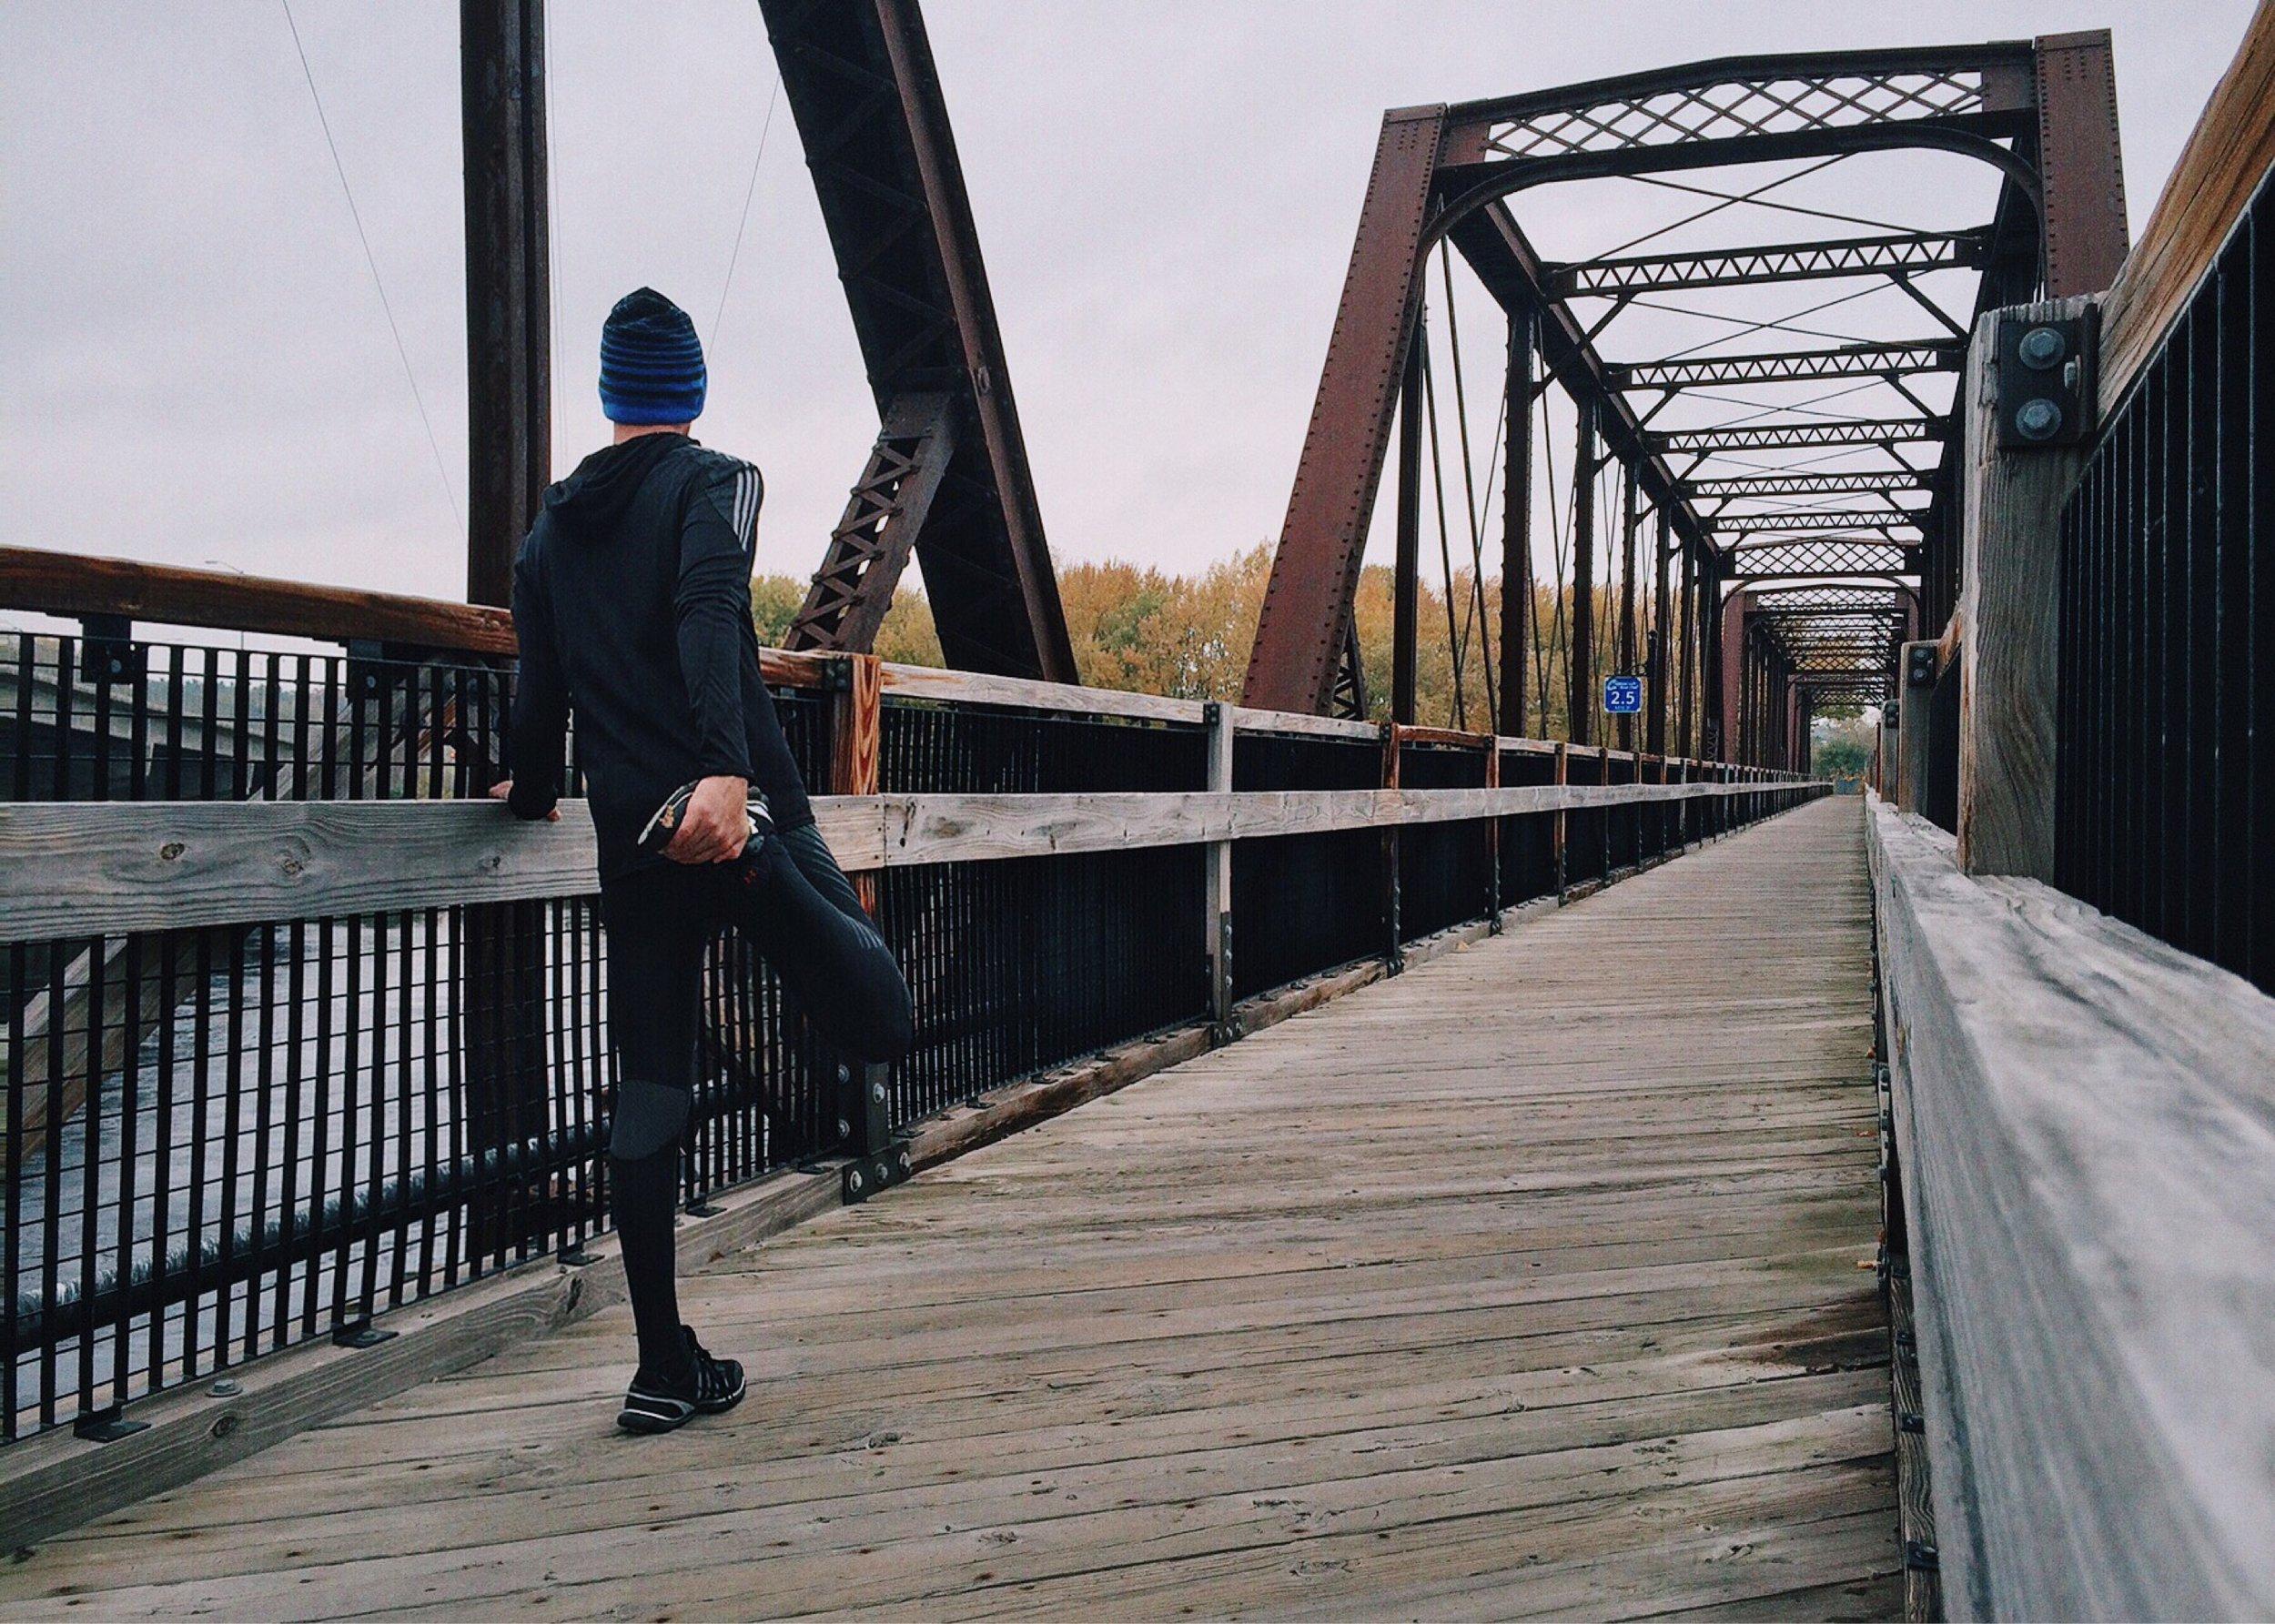 boulder-running-stretching-exercises